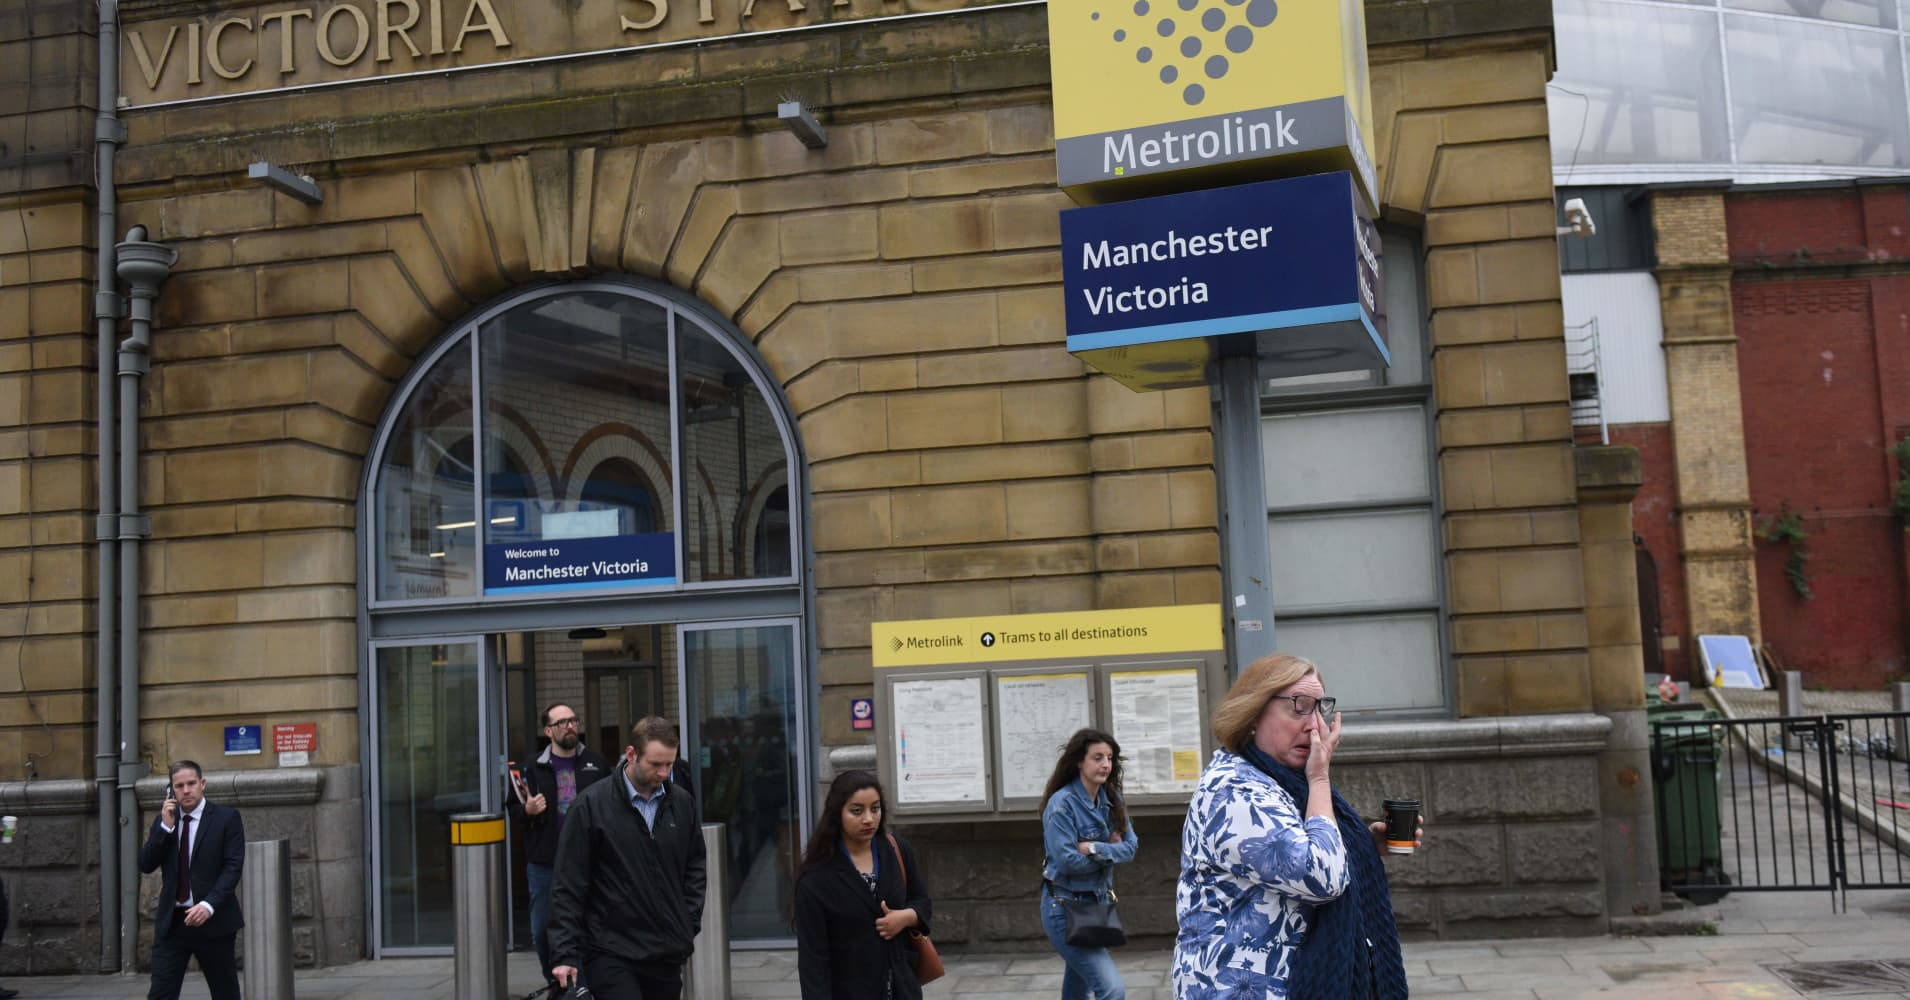 UK counter terrorism police investigate stabbings in Manchester